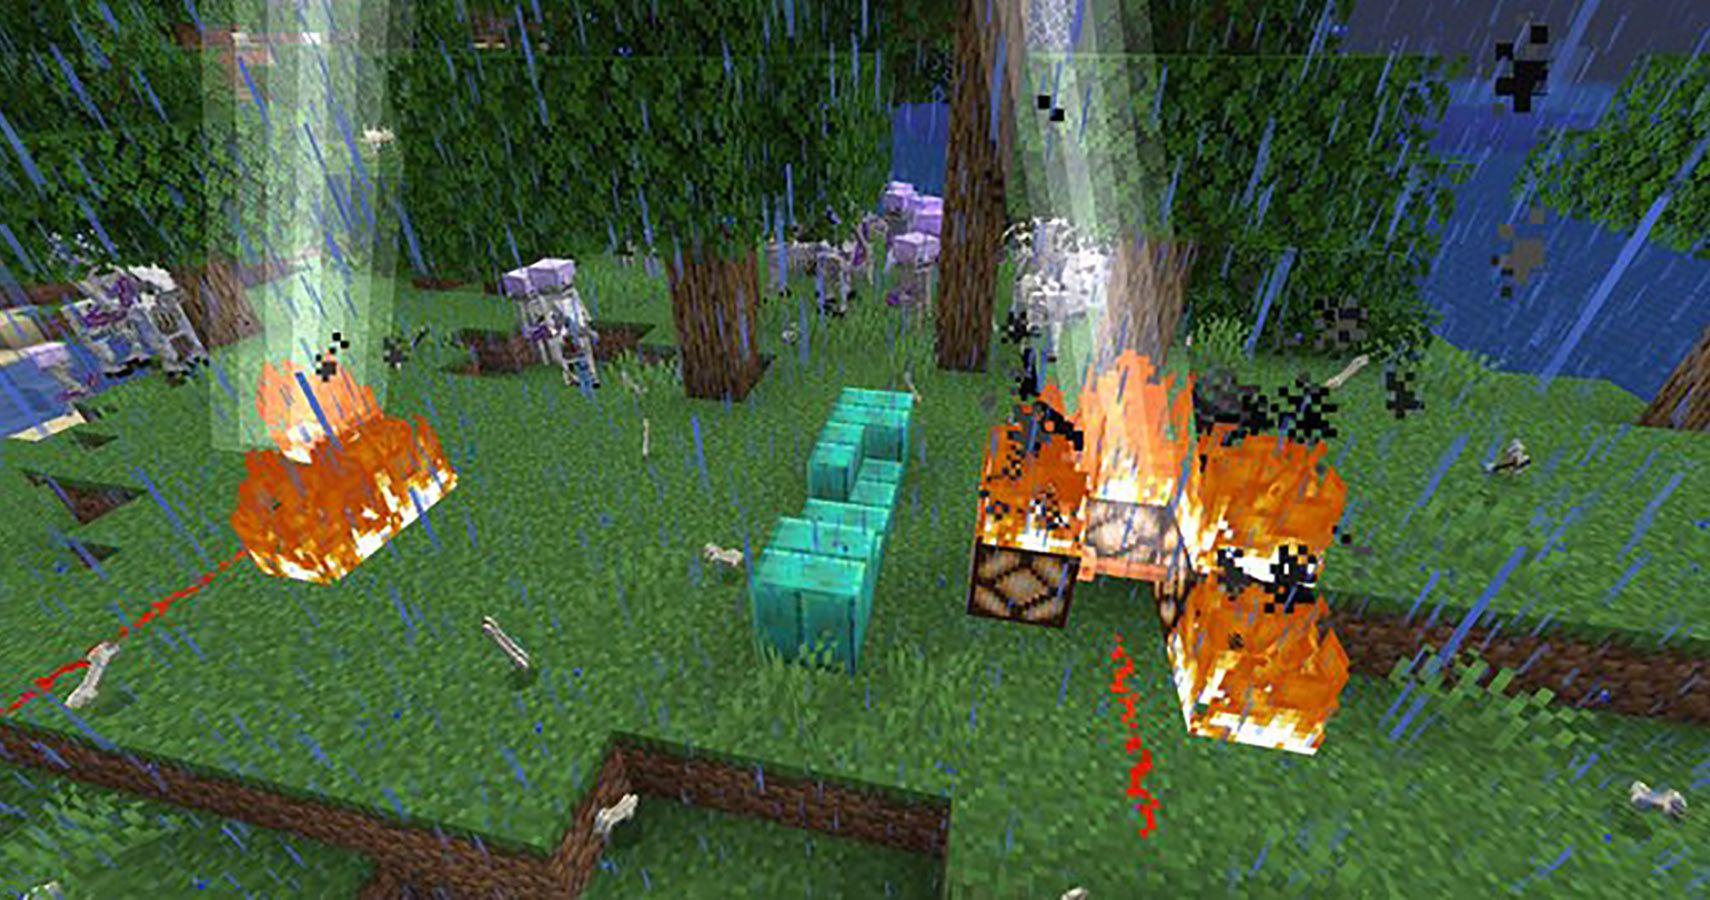 Minecraft Developer Hints At New Redstone Uses For Lightning Rod